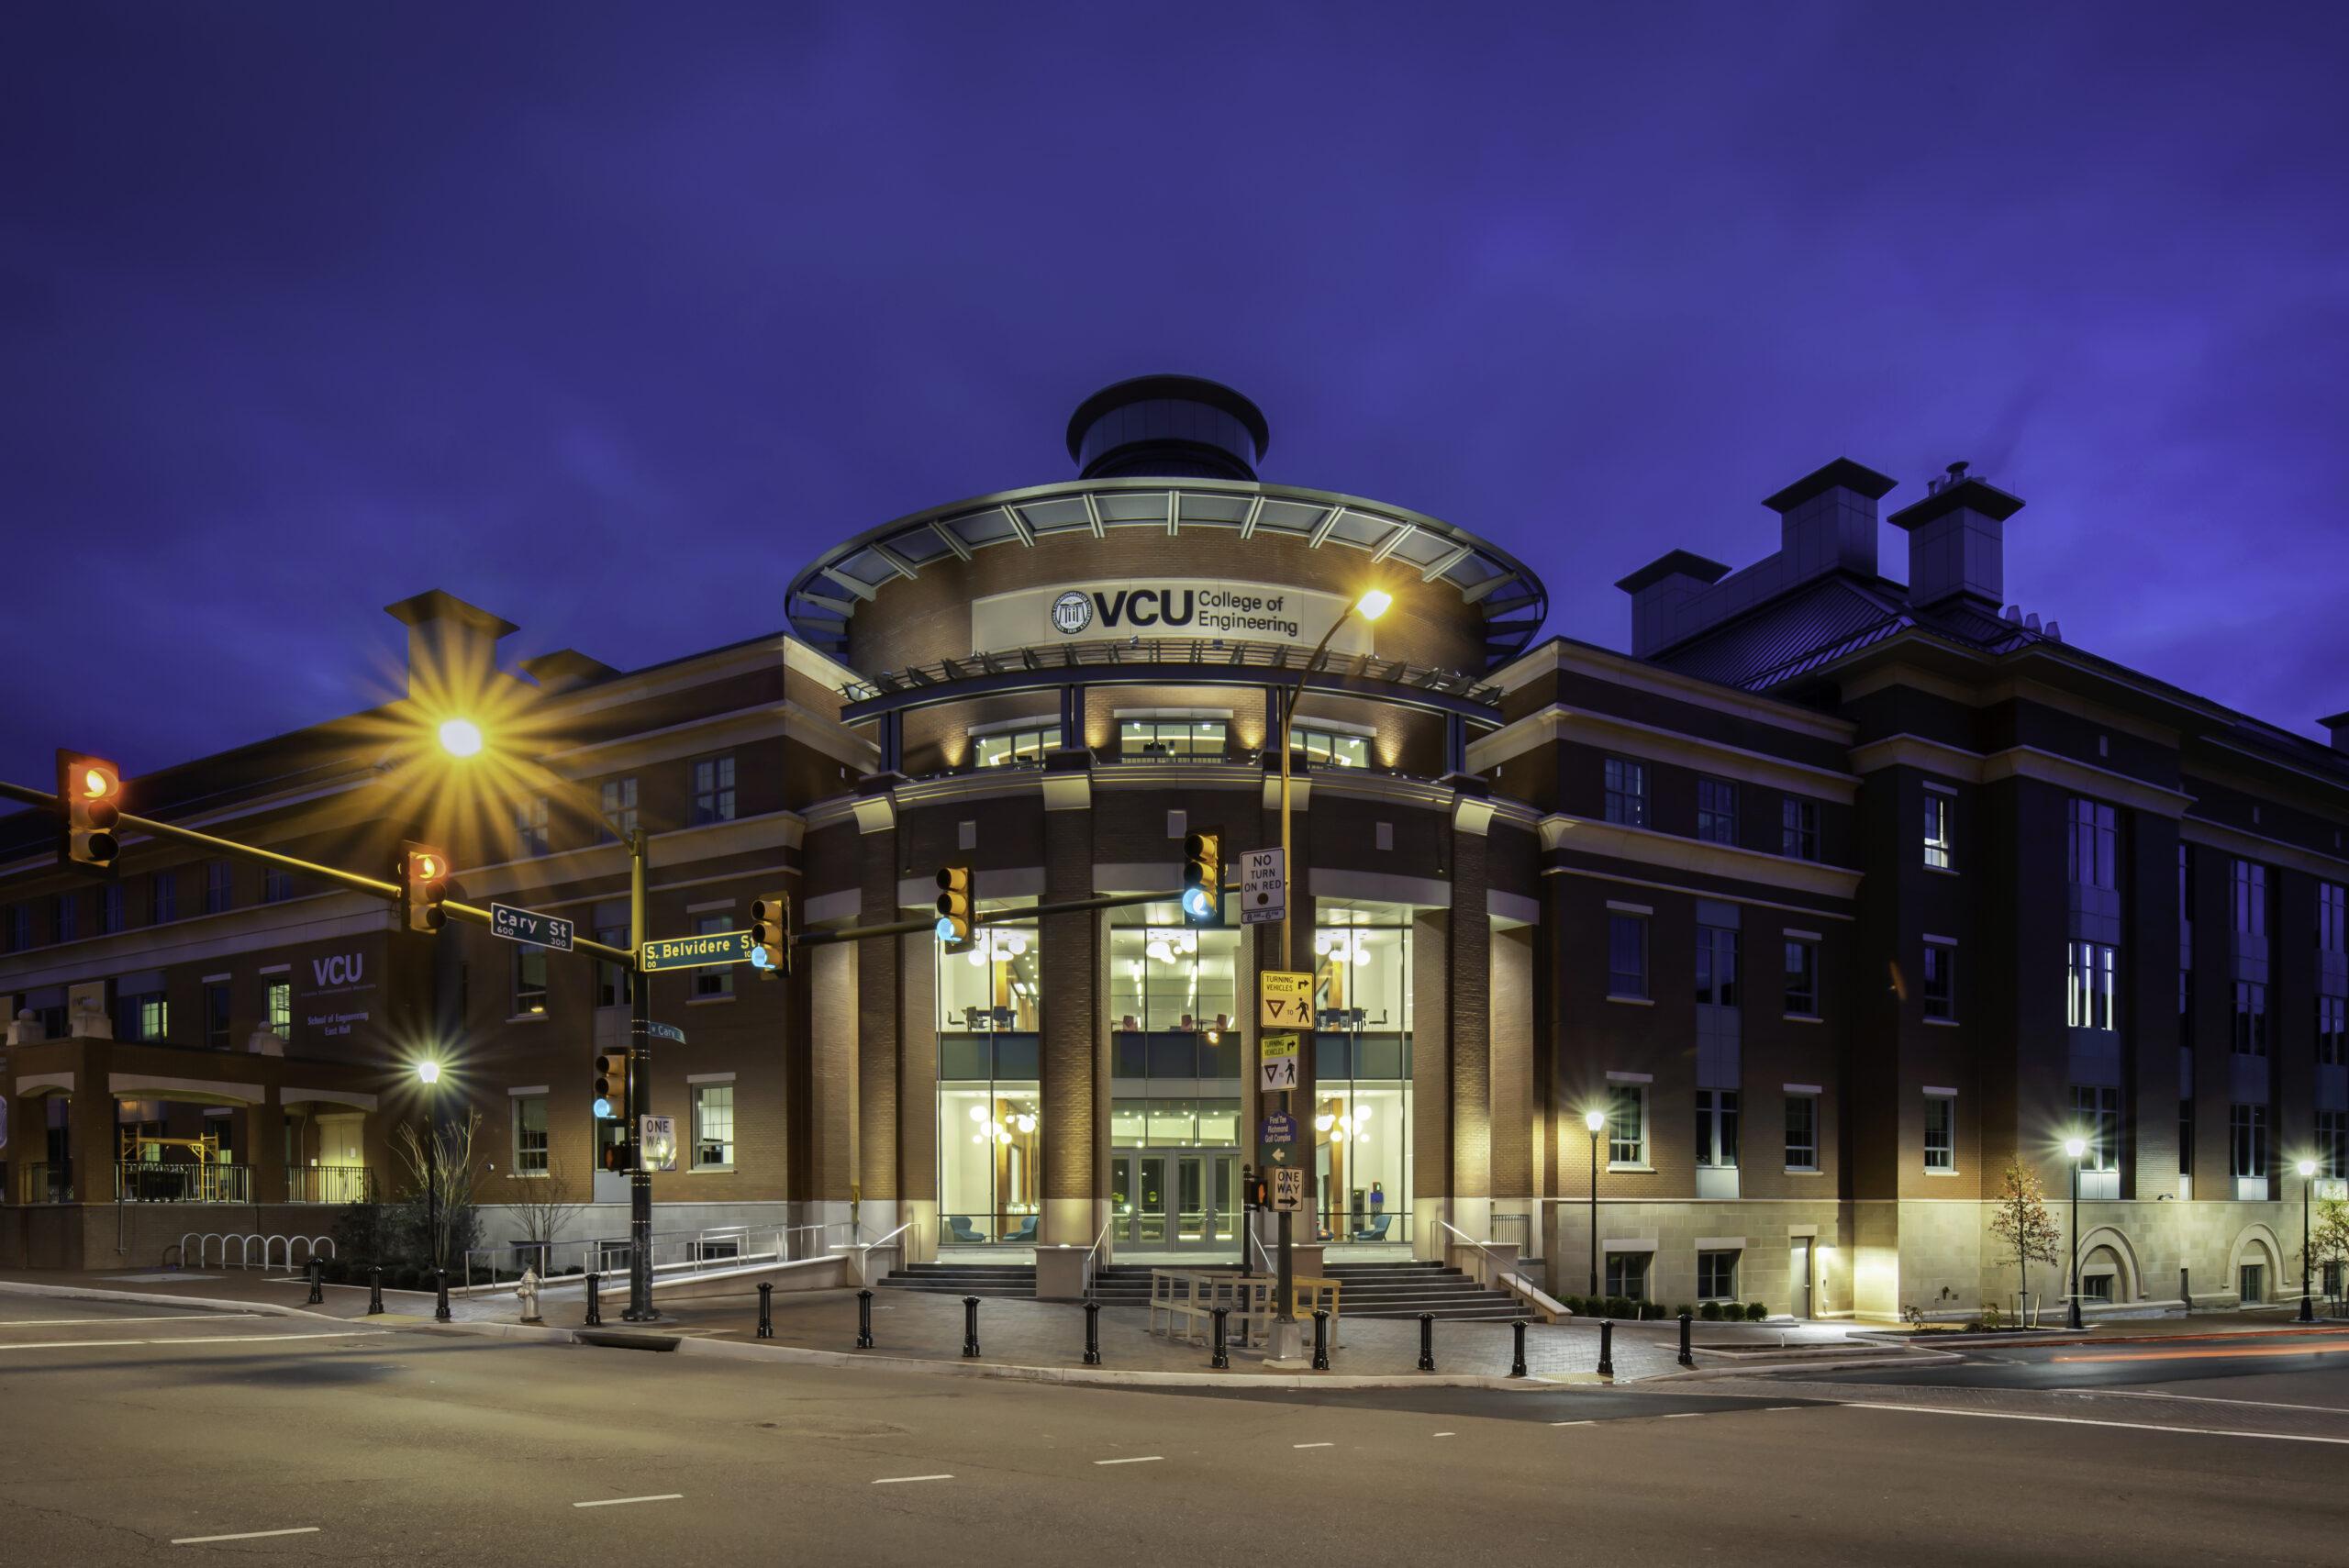 VCU's College of Engineering